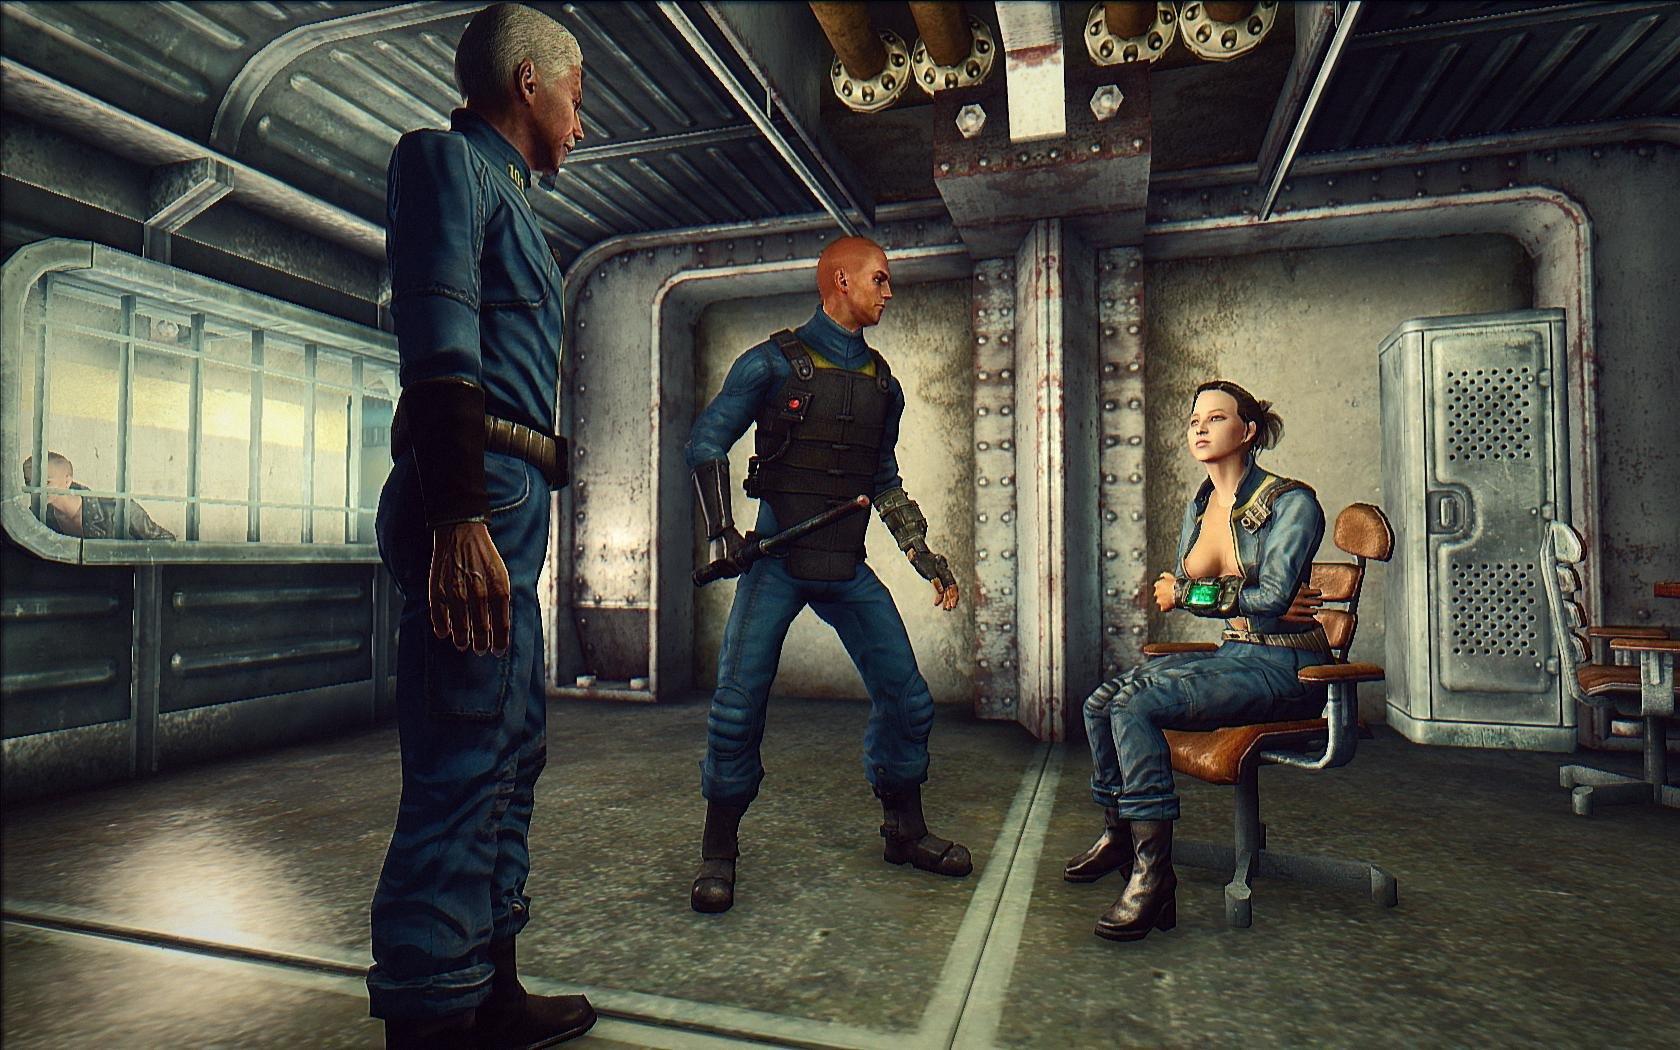 Fallout3 2018-10-01 22-07-07-83.jpg